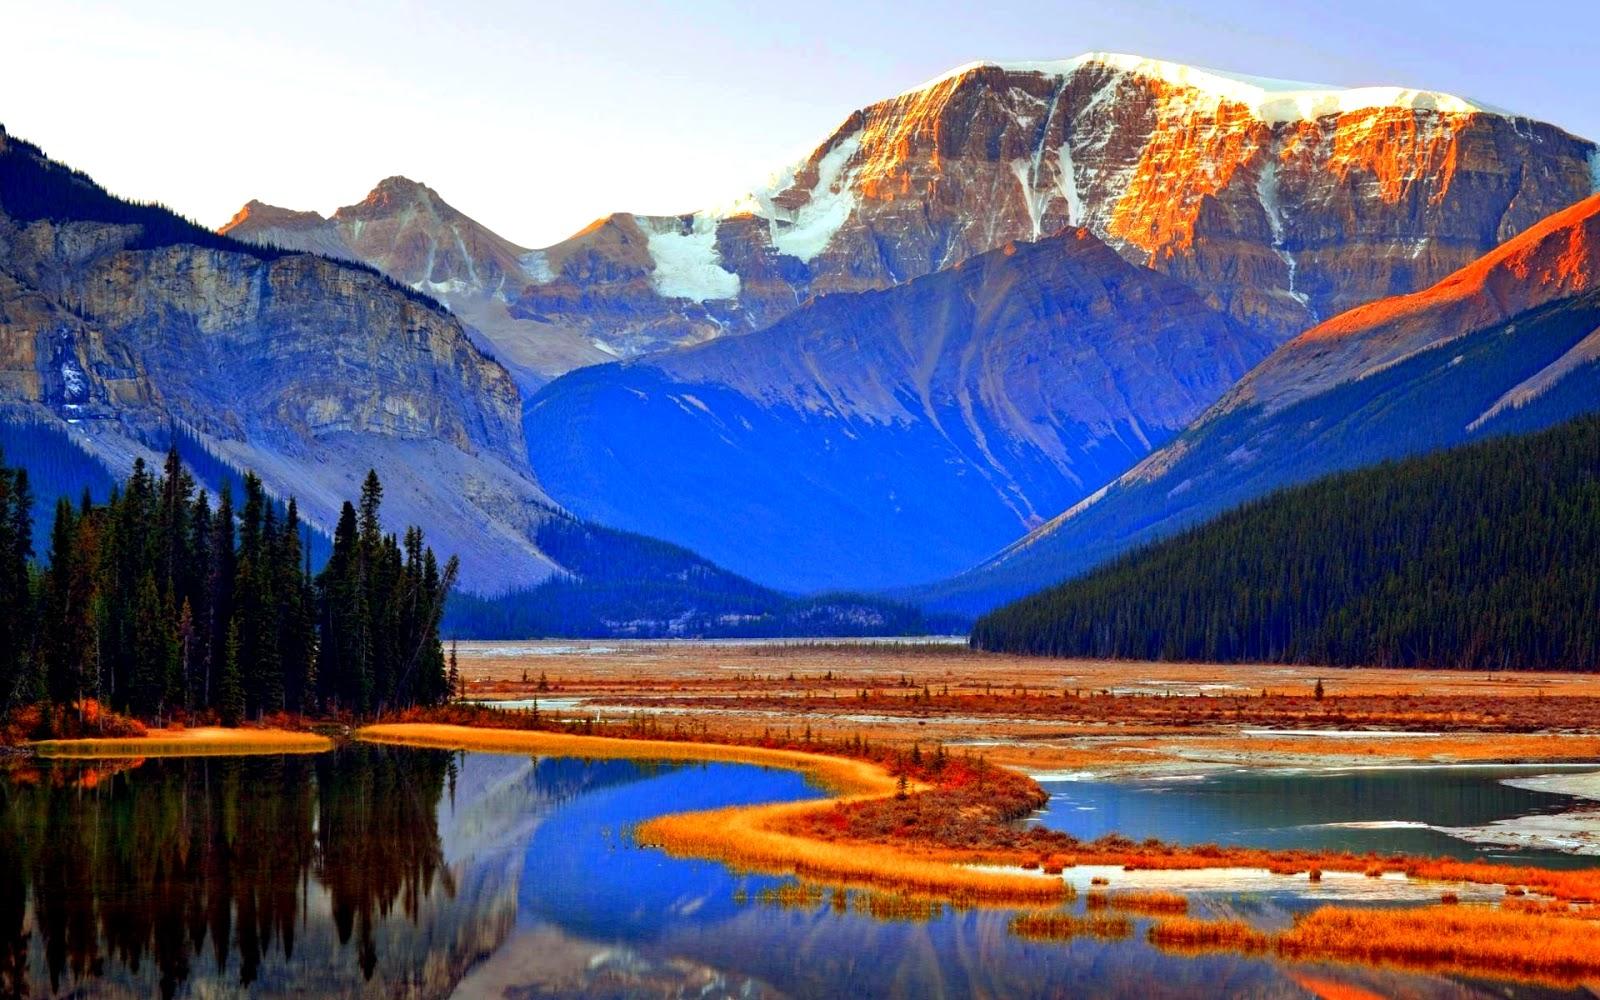 Jasper National Park Beauty Of The World 1600x1000